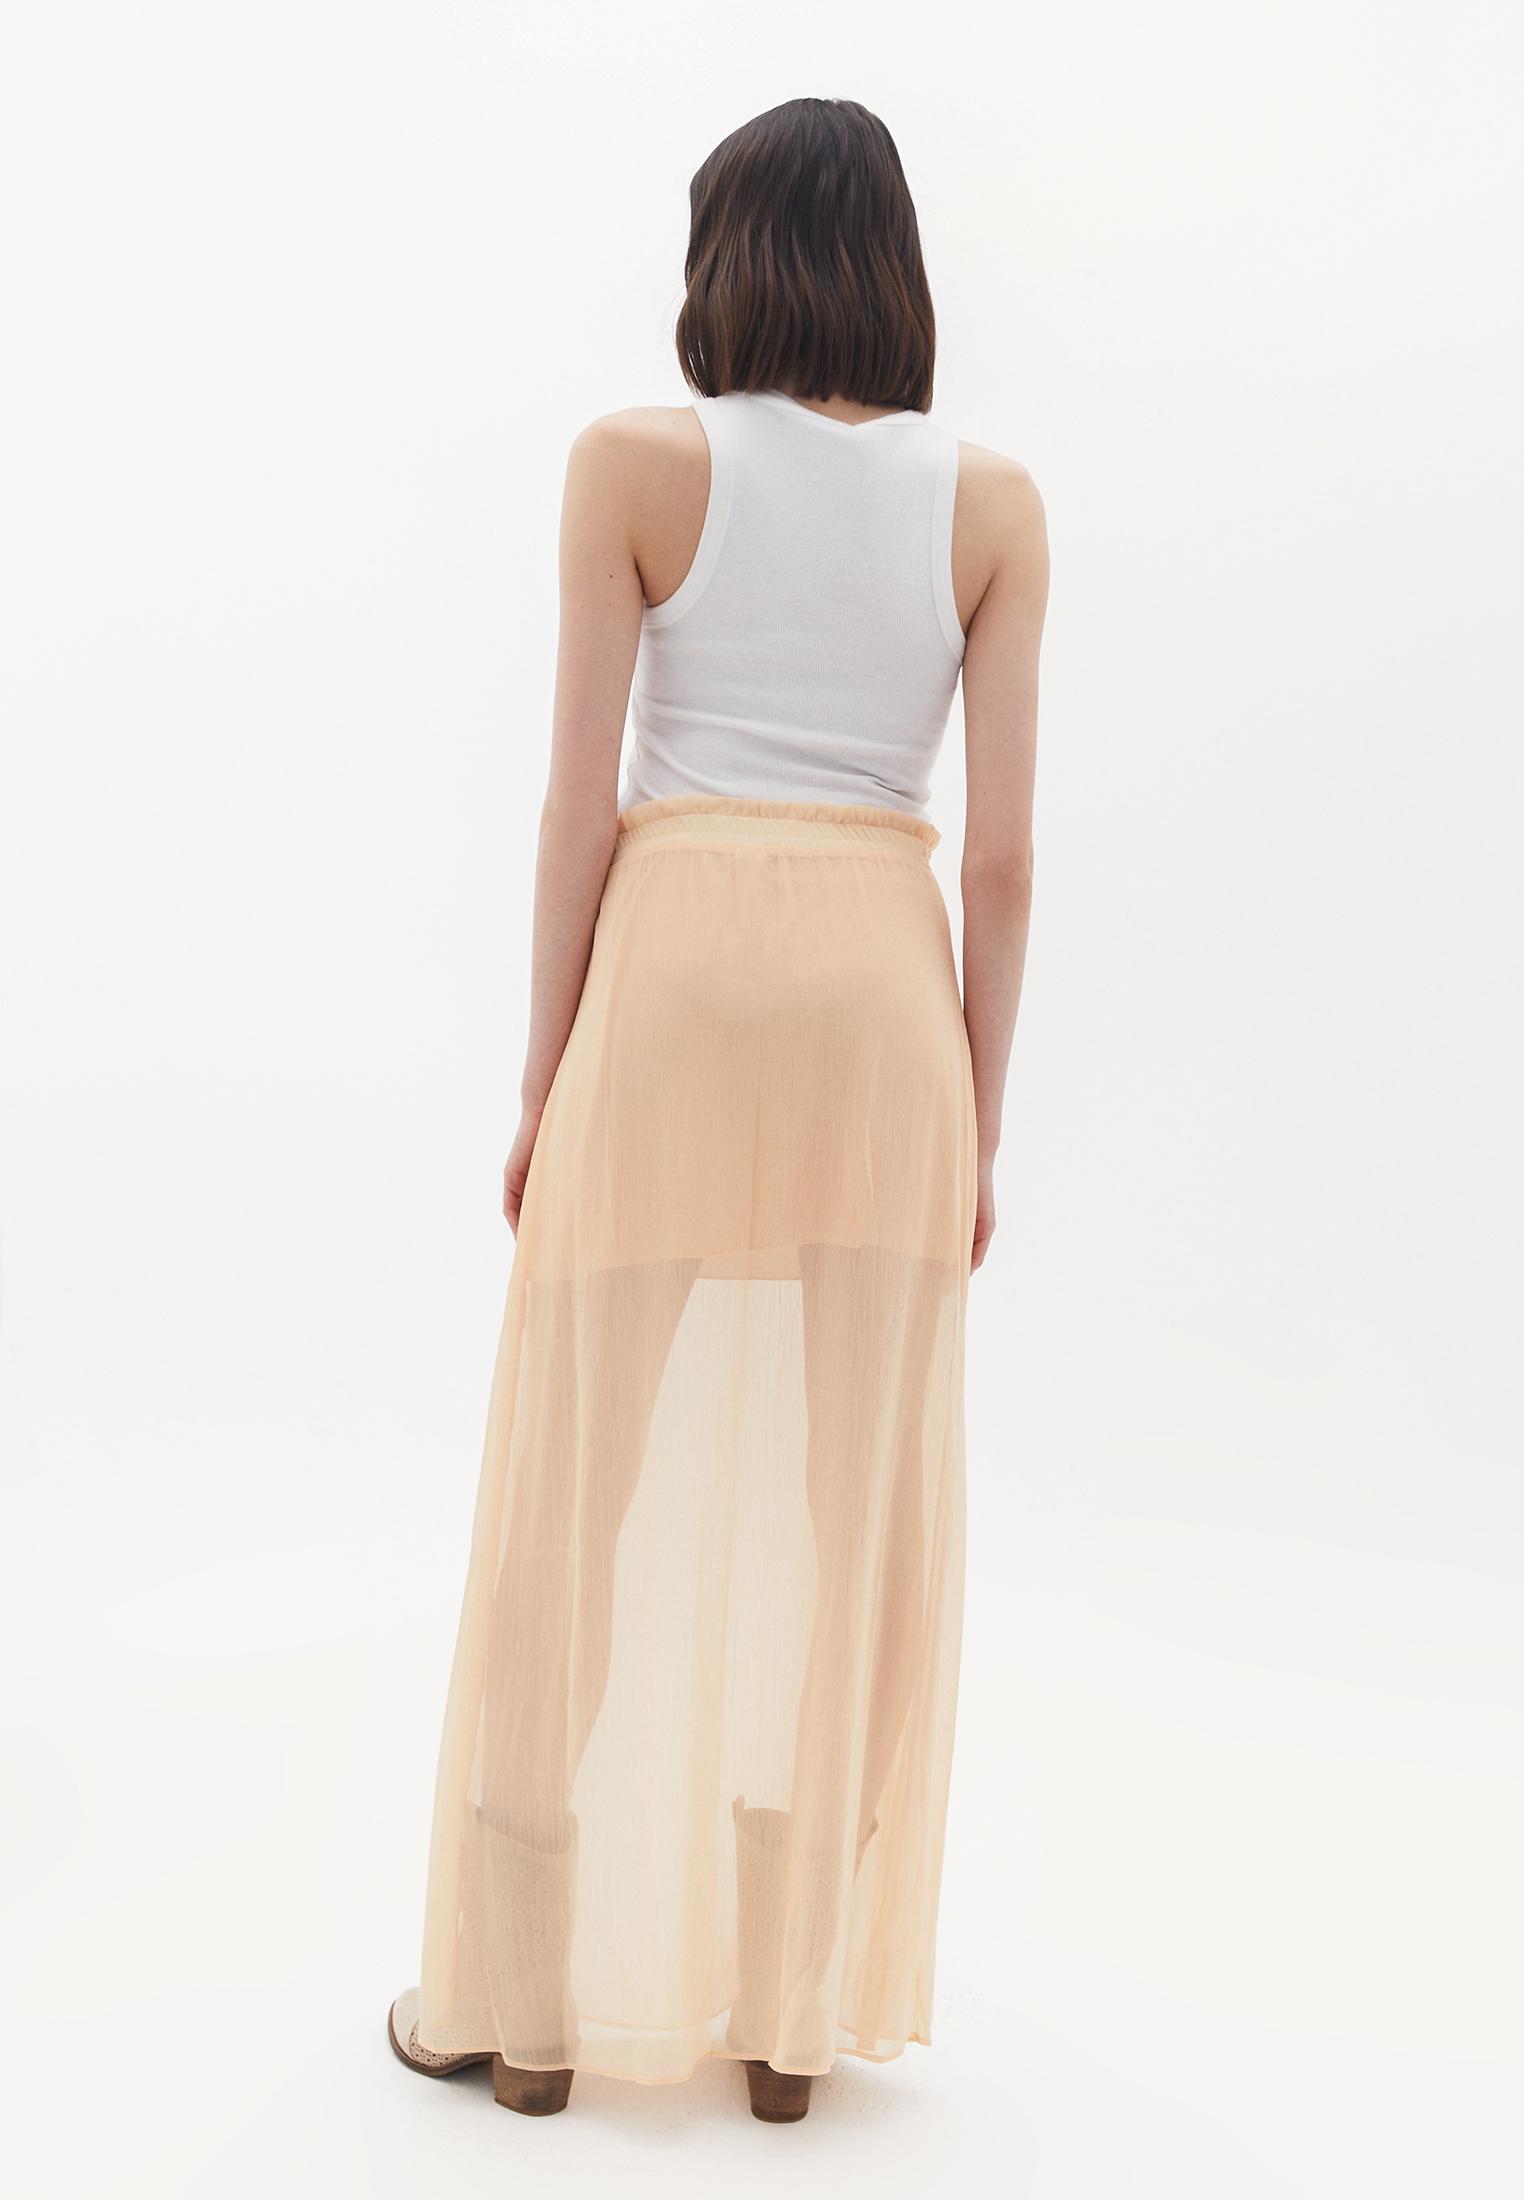 Bayan Turuncu Transparan Detaylı Uzun Etek